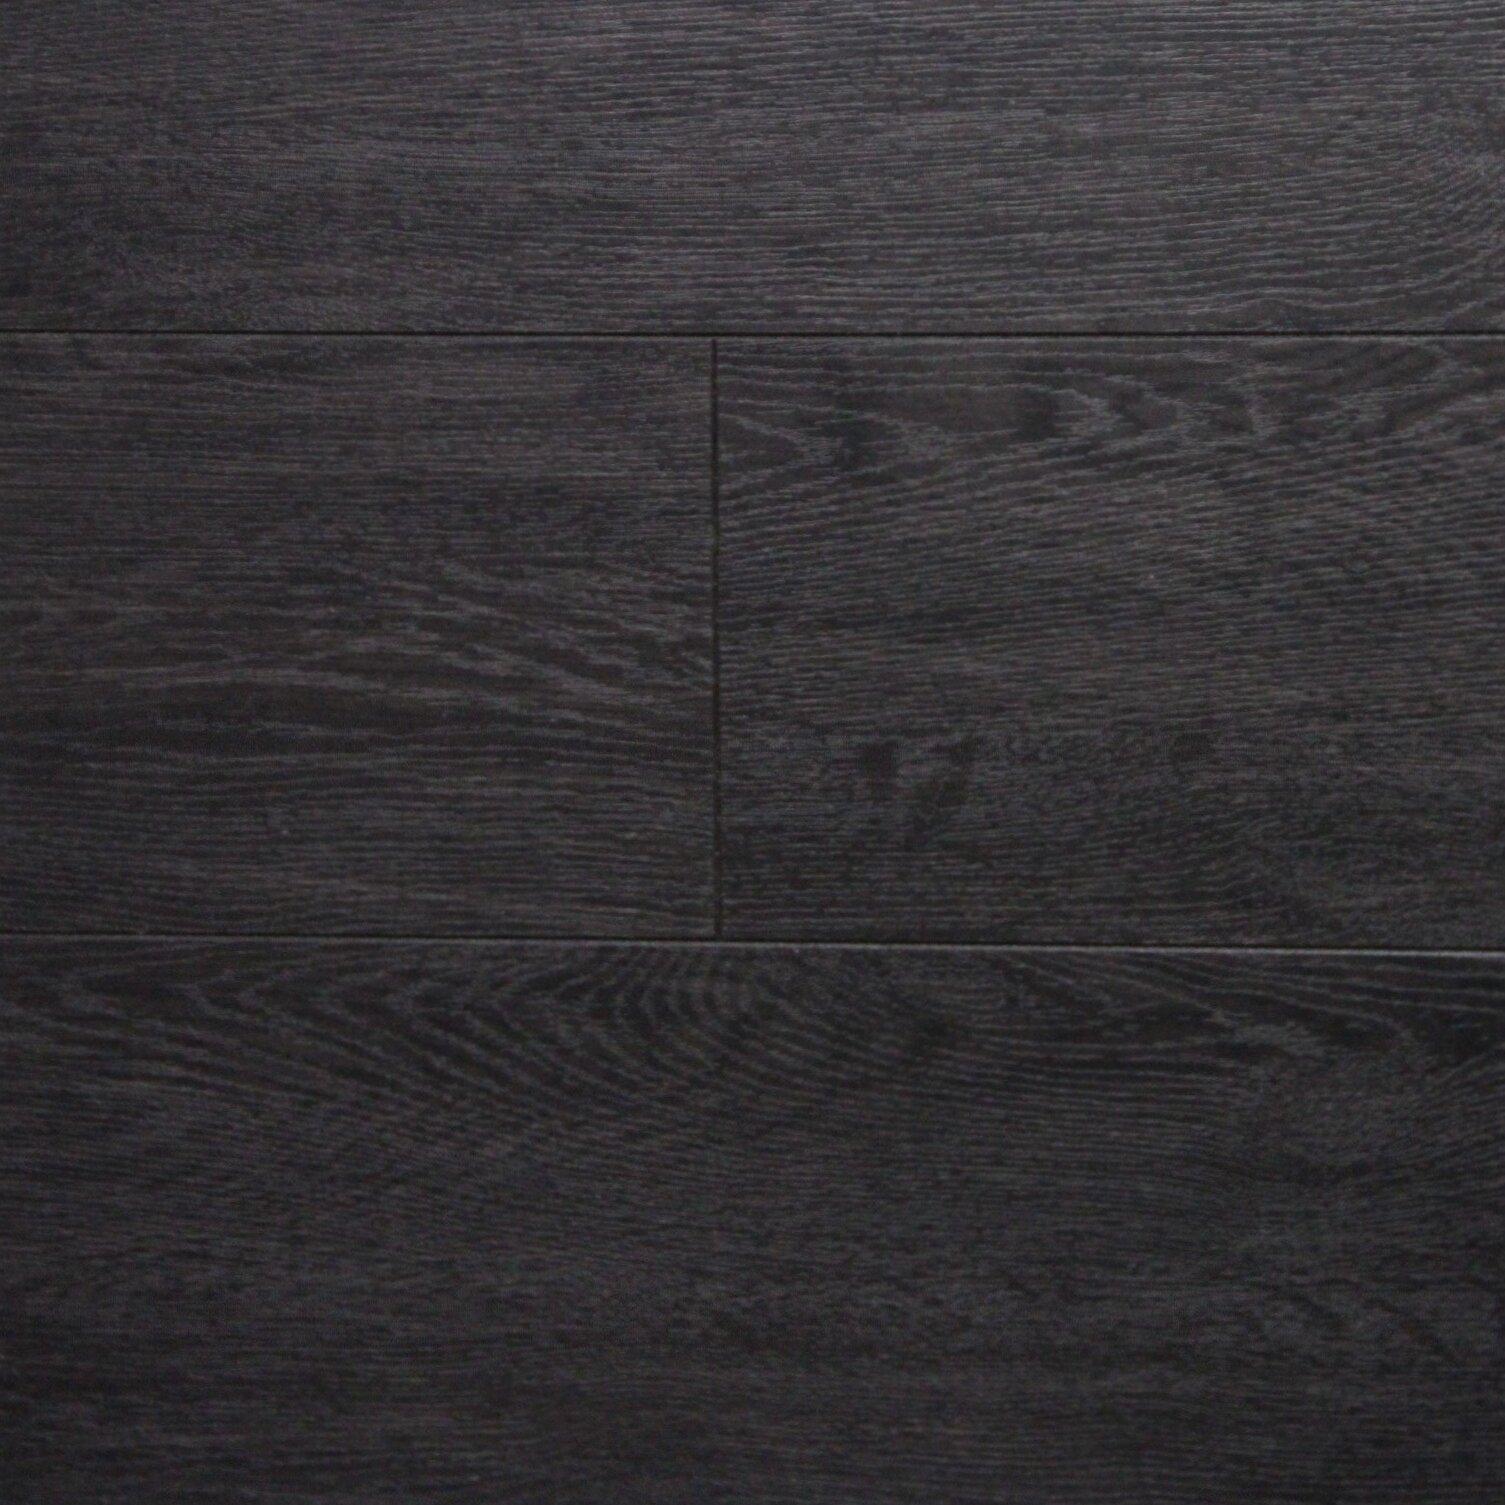 Serradon 6 X 48 12 3mm Laminate Flooring In Dark Wenge Reviews Wayfair